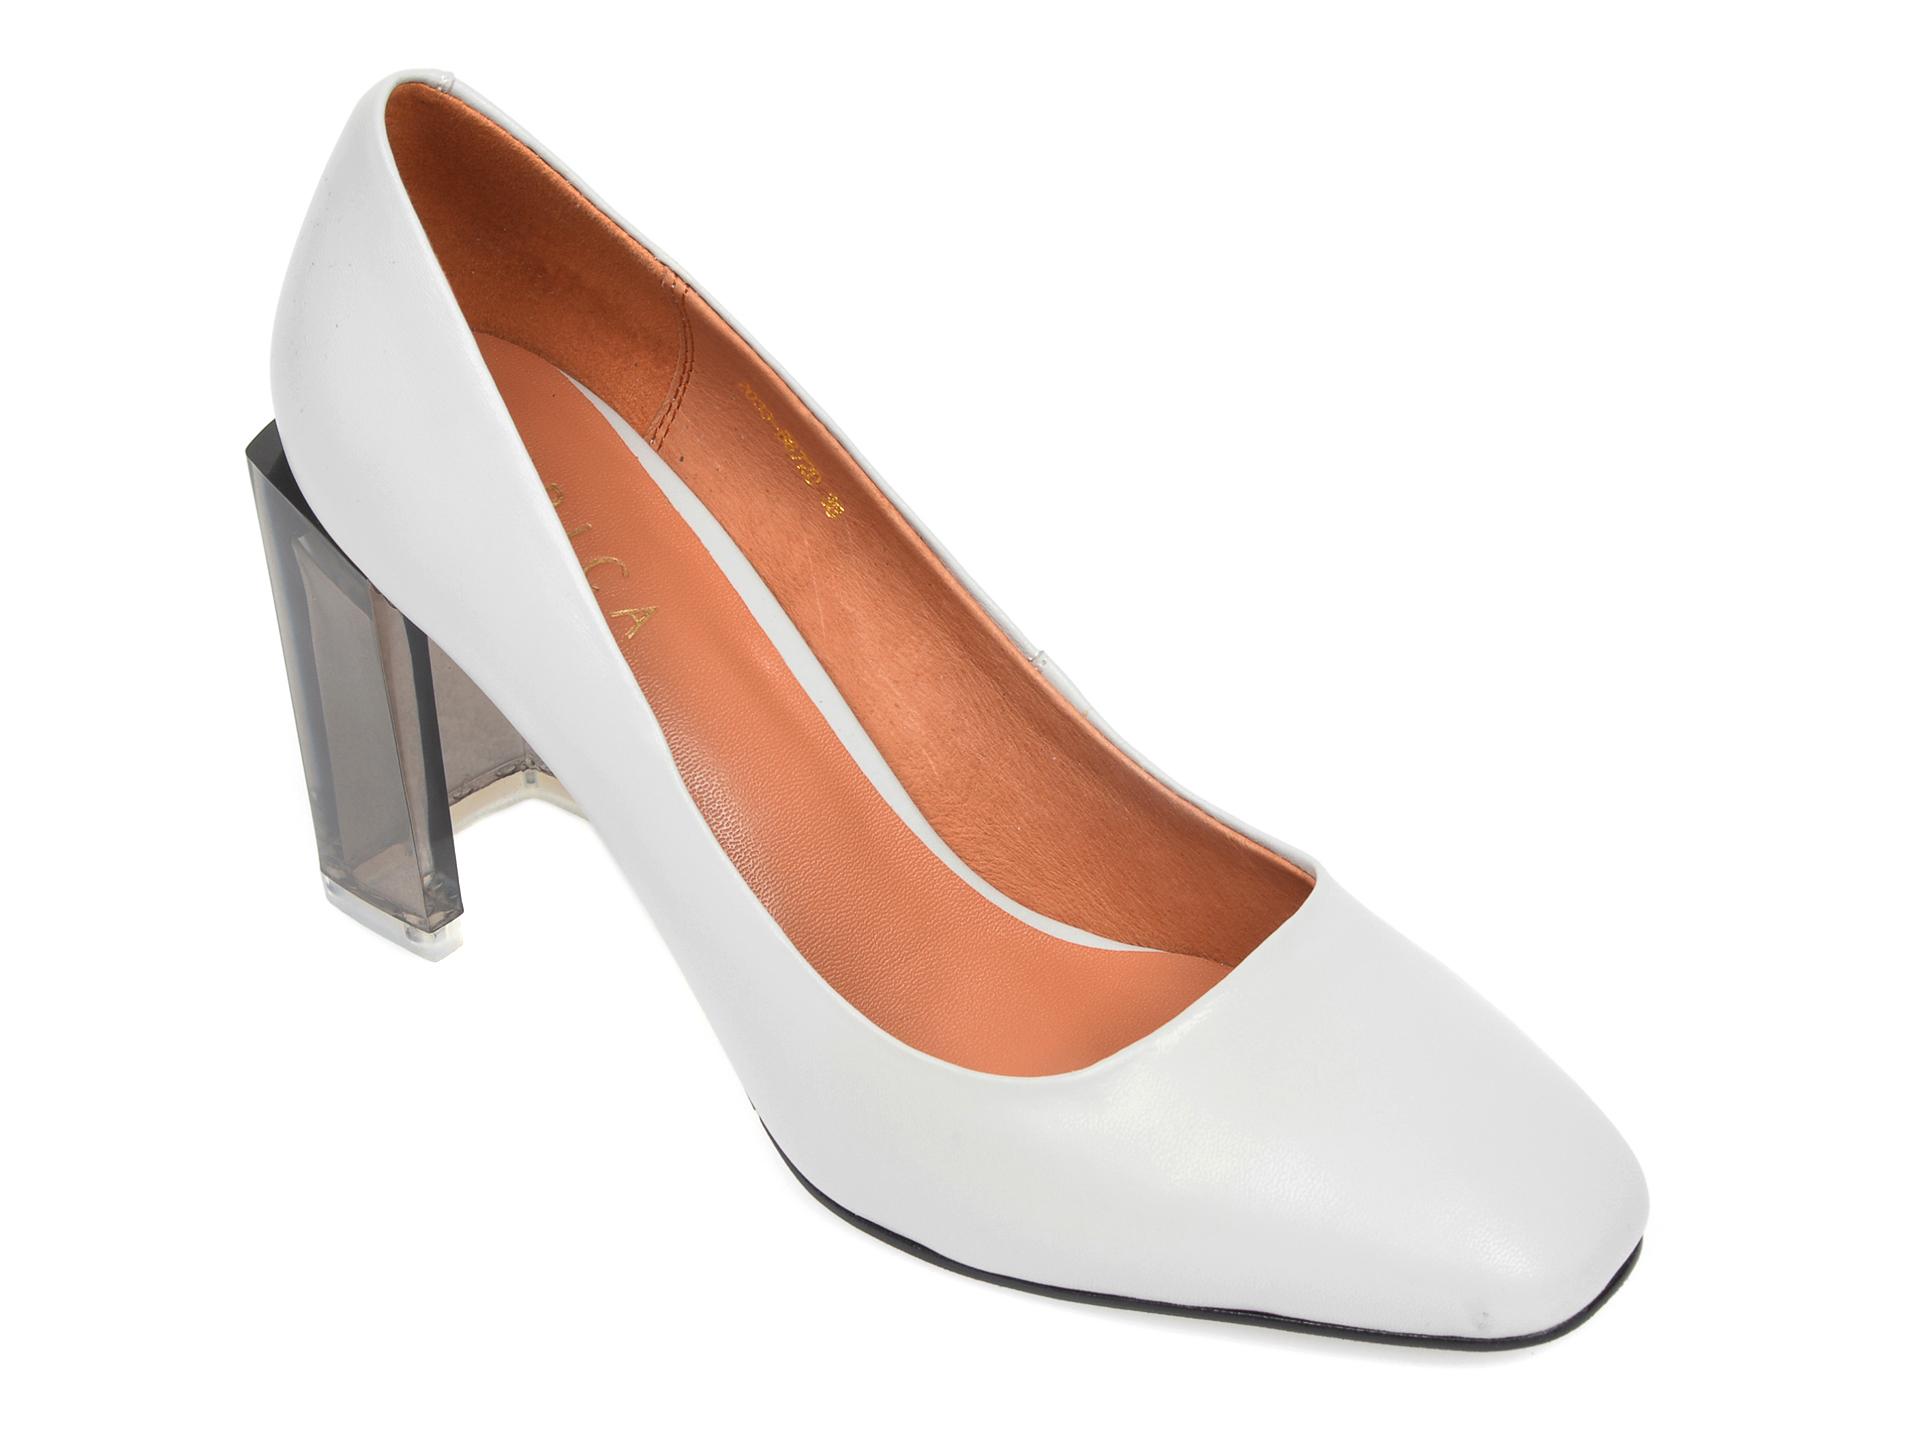 Pantofi EPICA gri, 2033B87, din piele naturala imagine